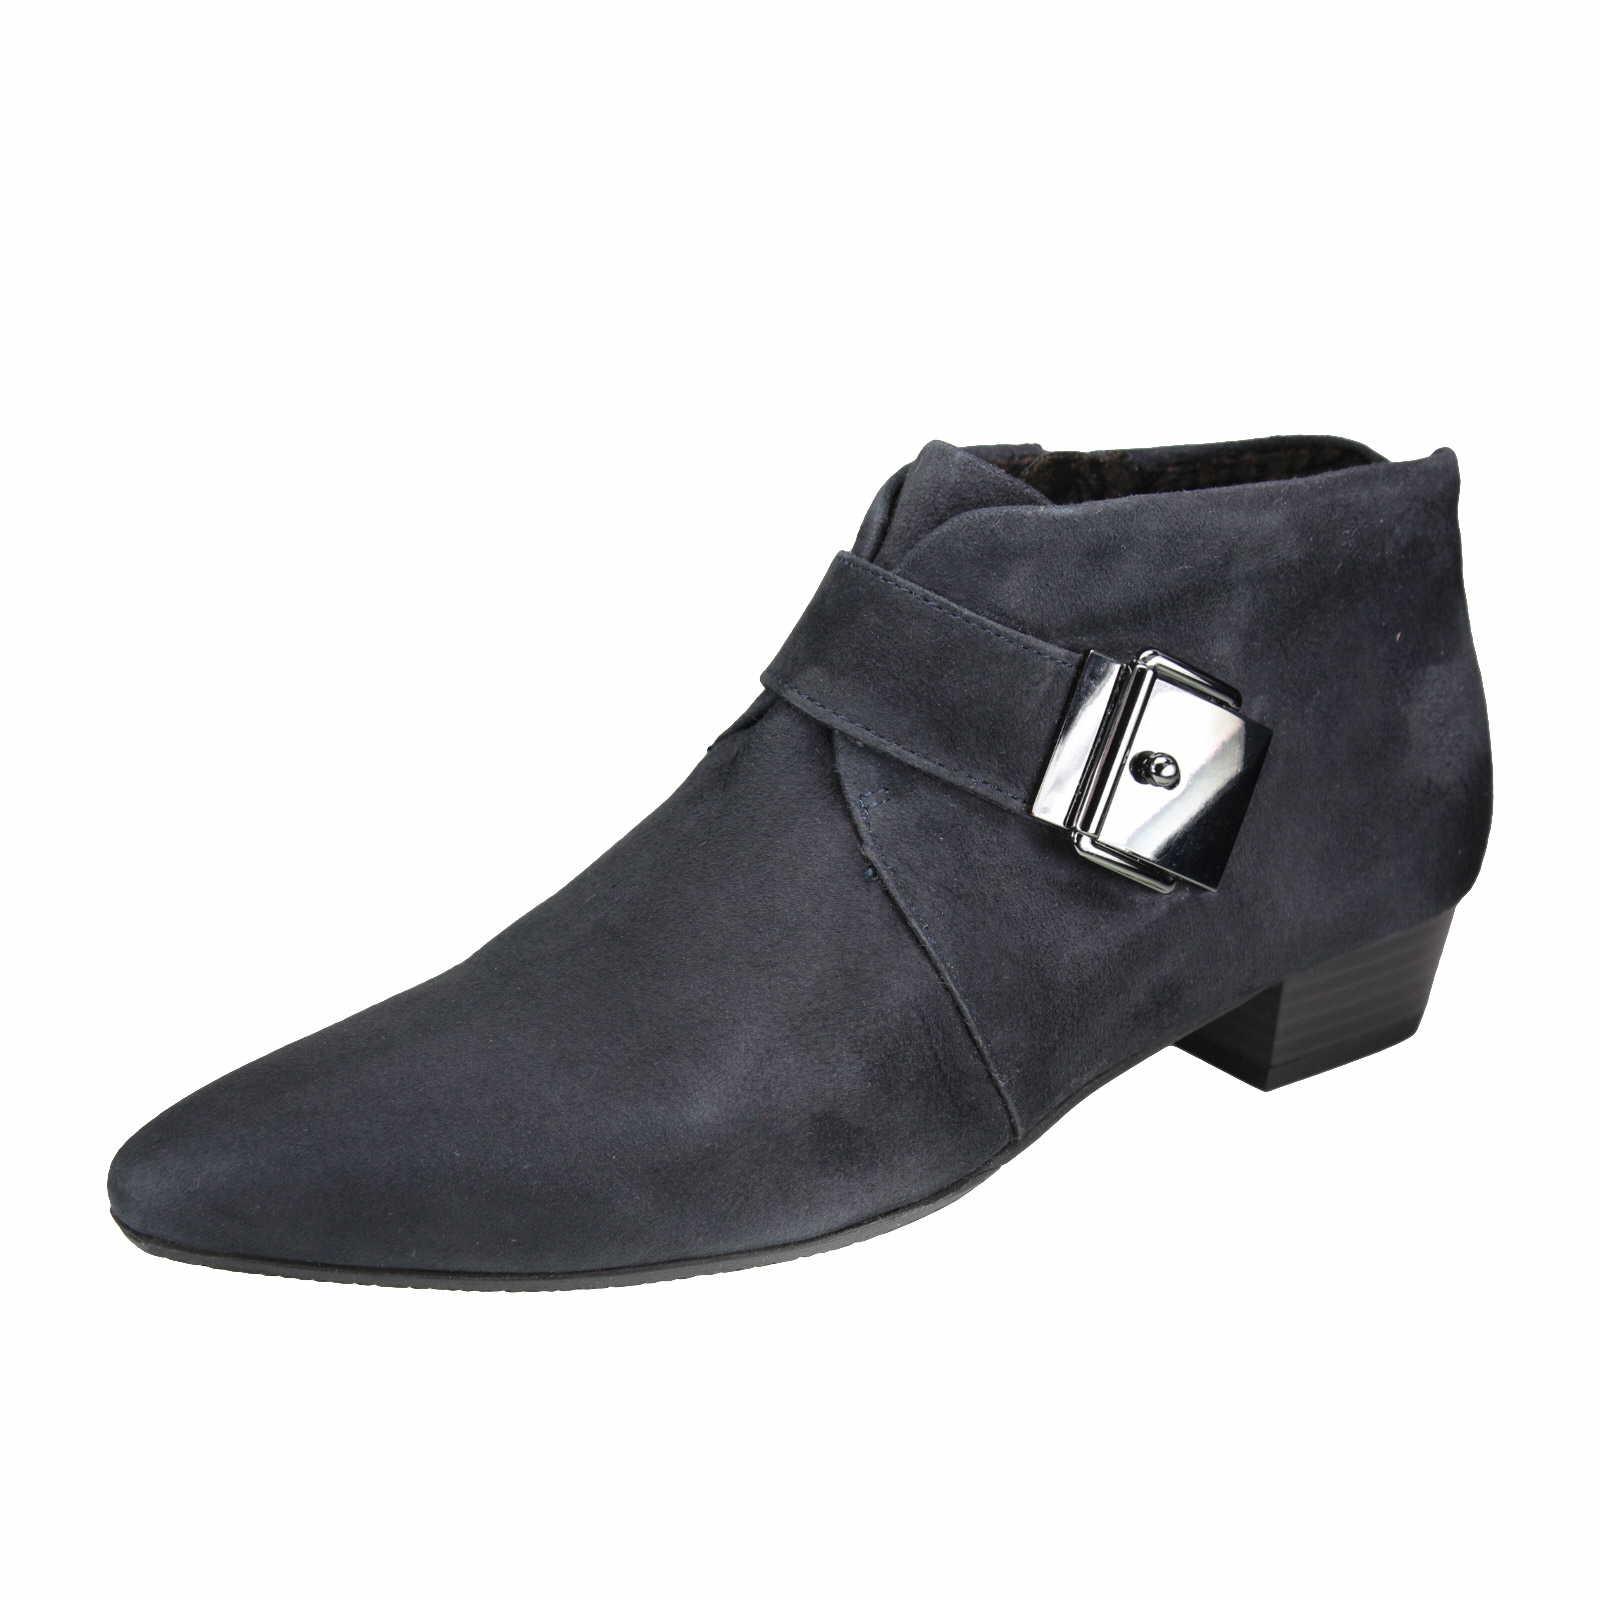 gerry weber shoes blau nora 03 g53103 mi32 505 schuhparadies online shop schuhe einfach. Black Bedroom Furniture Sets. Home Design Ideas